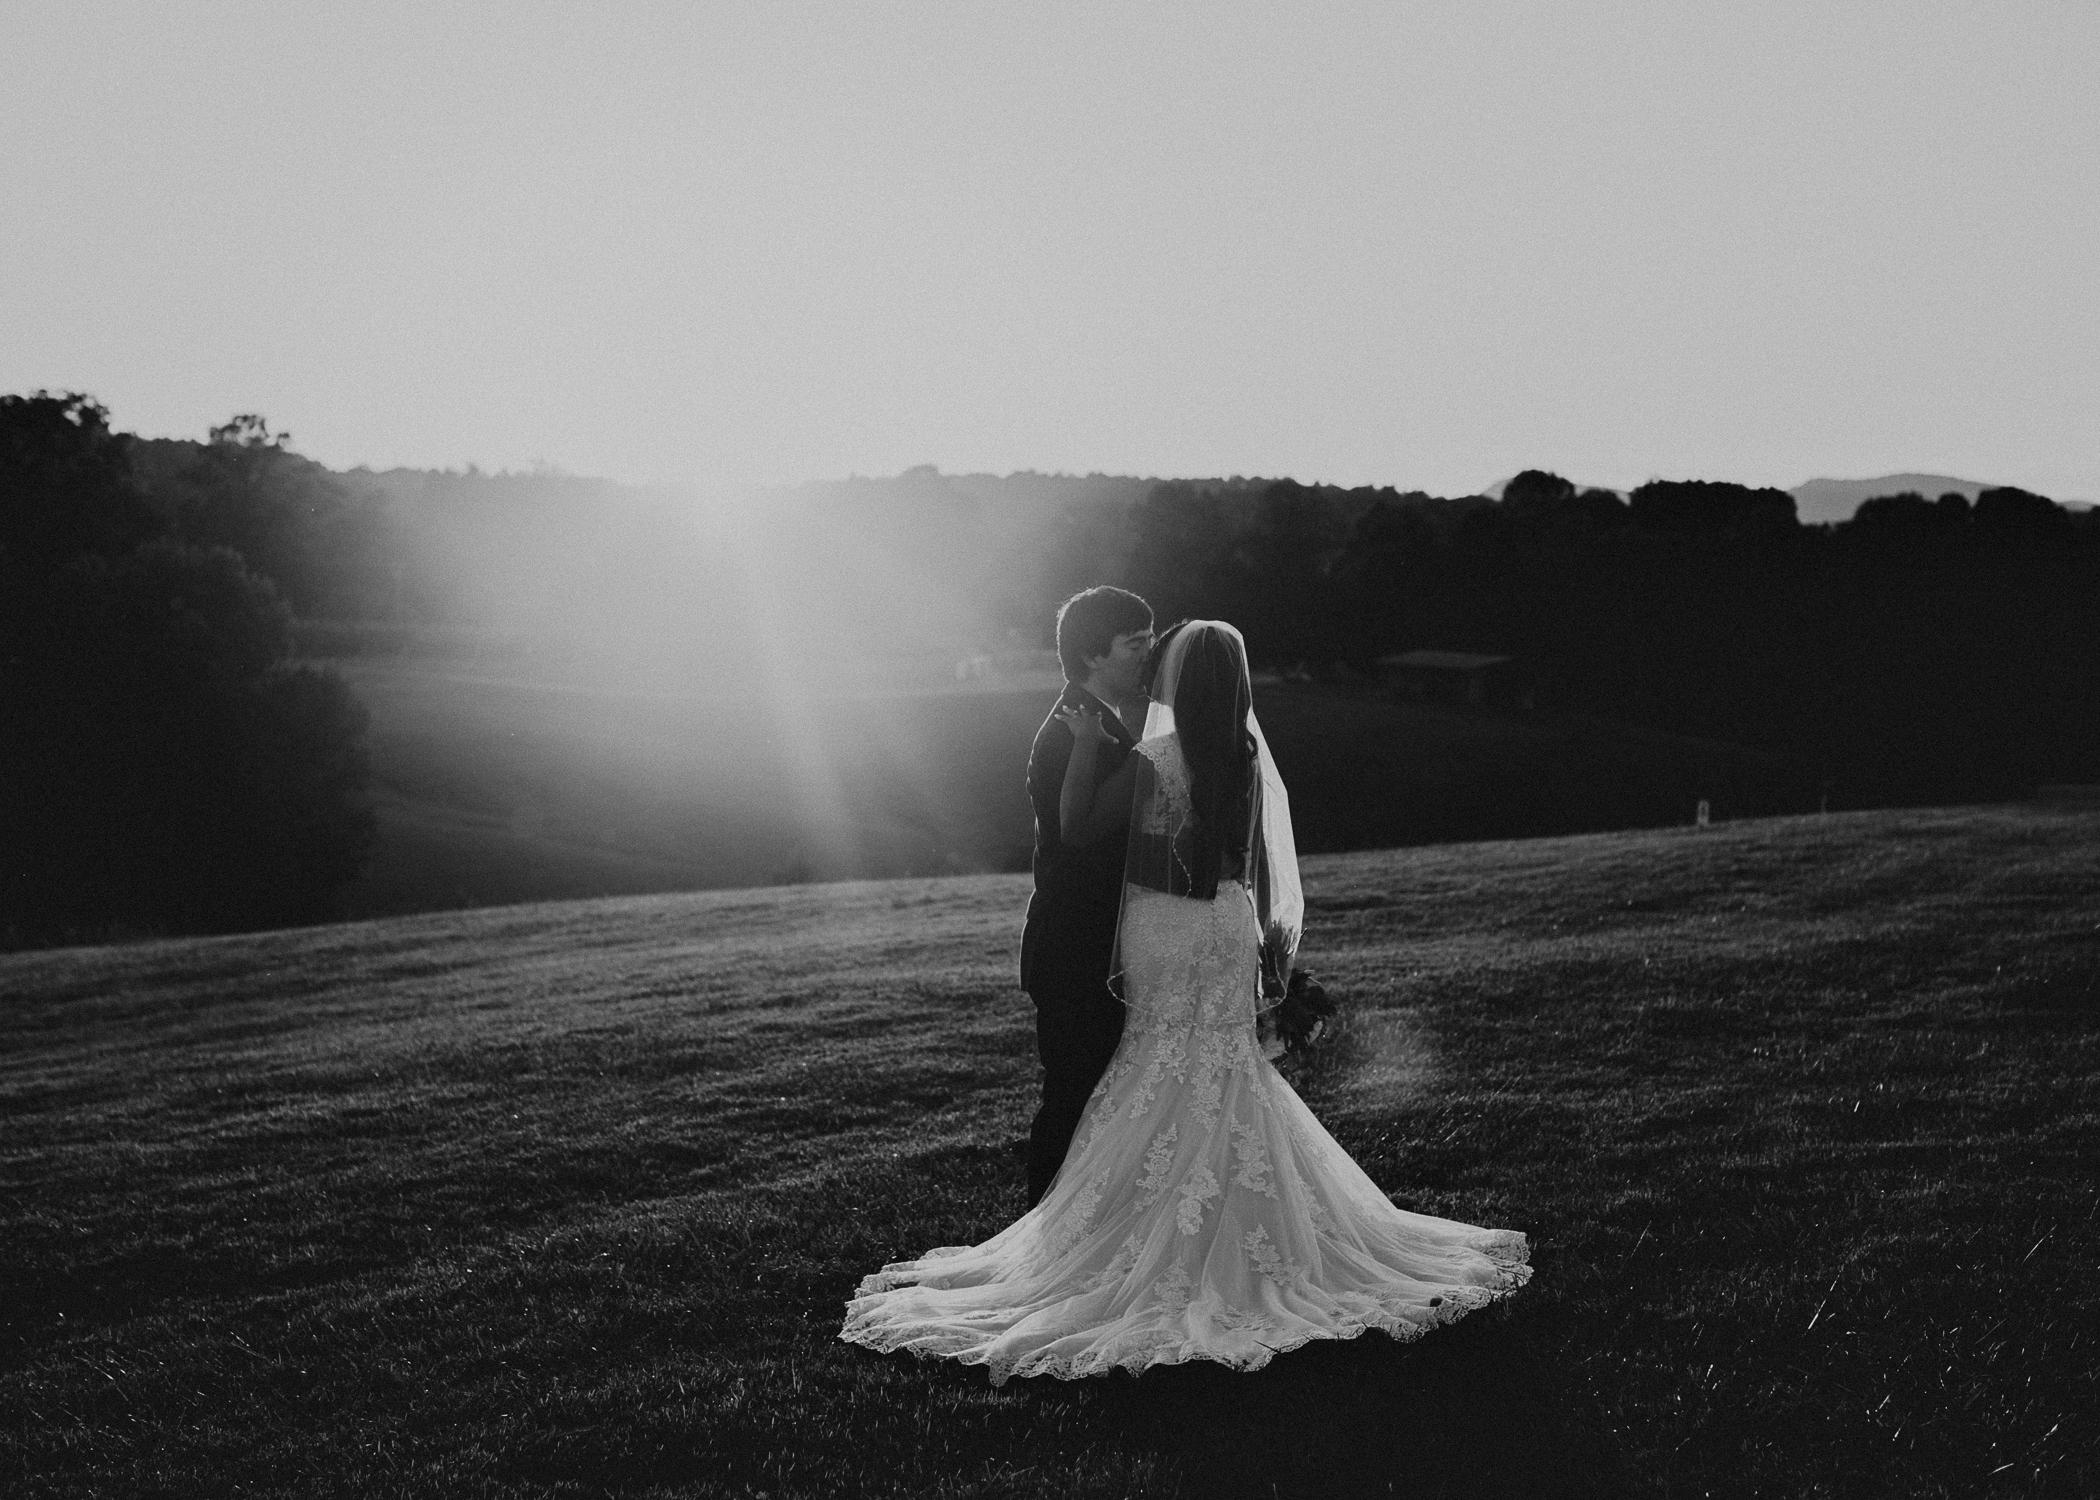 75- Kaya_vineyard_dahlonega_wedding_venue_bride_and_groom_sunset_pictures_aline_marin_photography.jpg